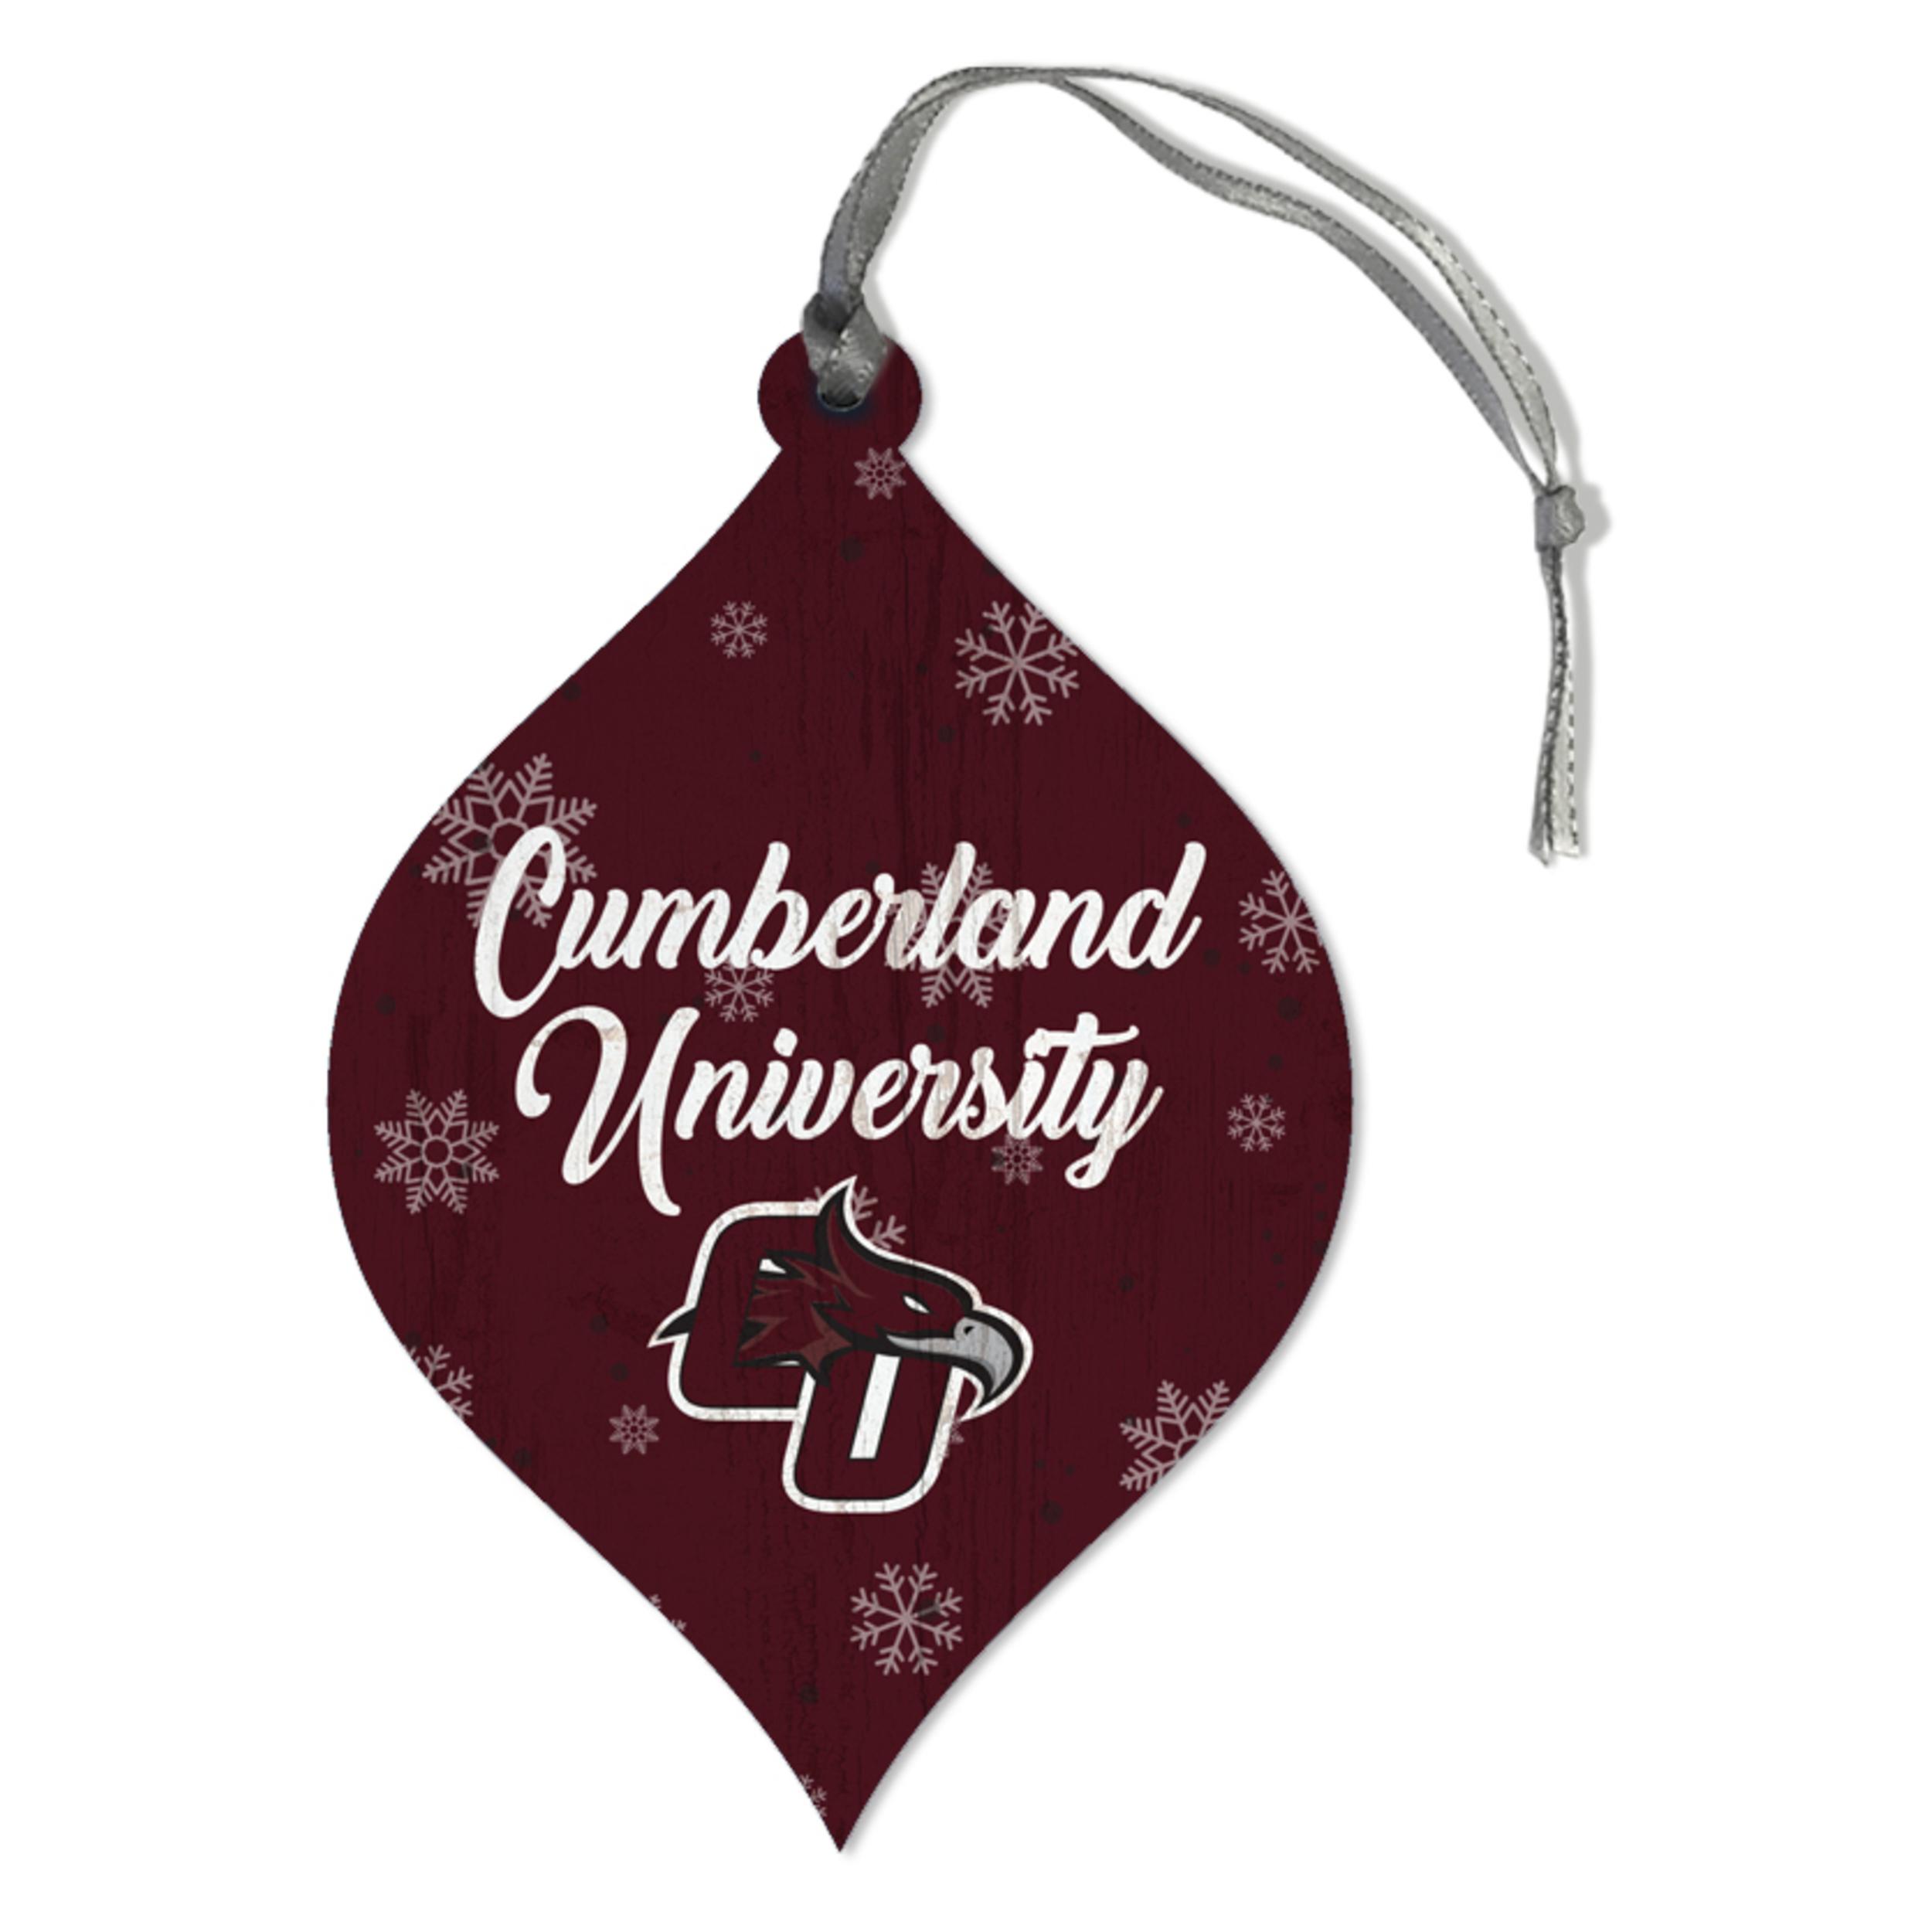 Cumberland University Snowflakes Teardrop Ornament